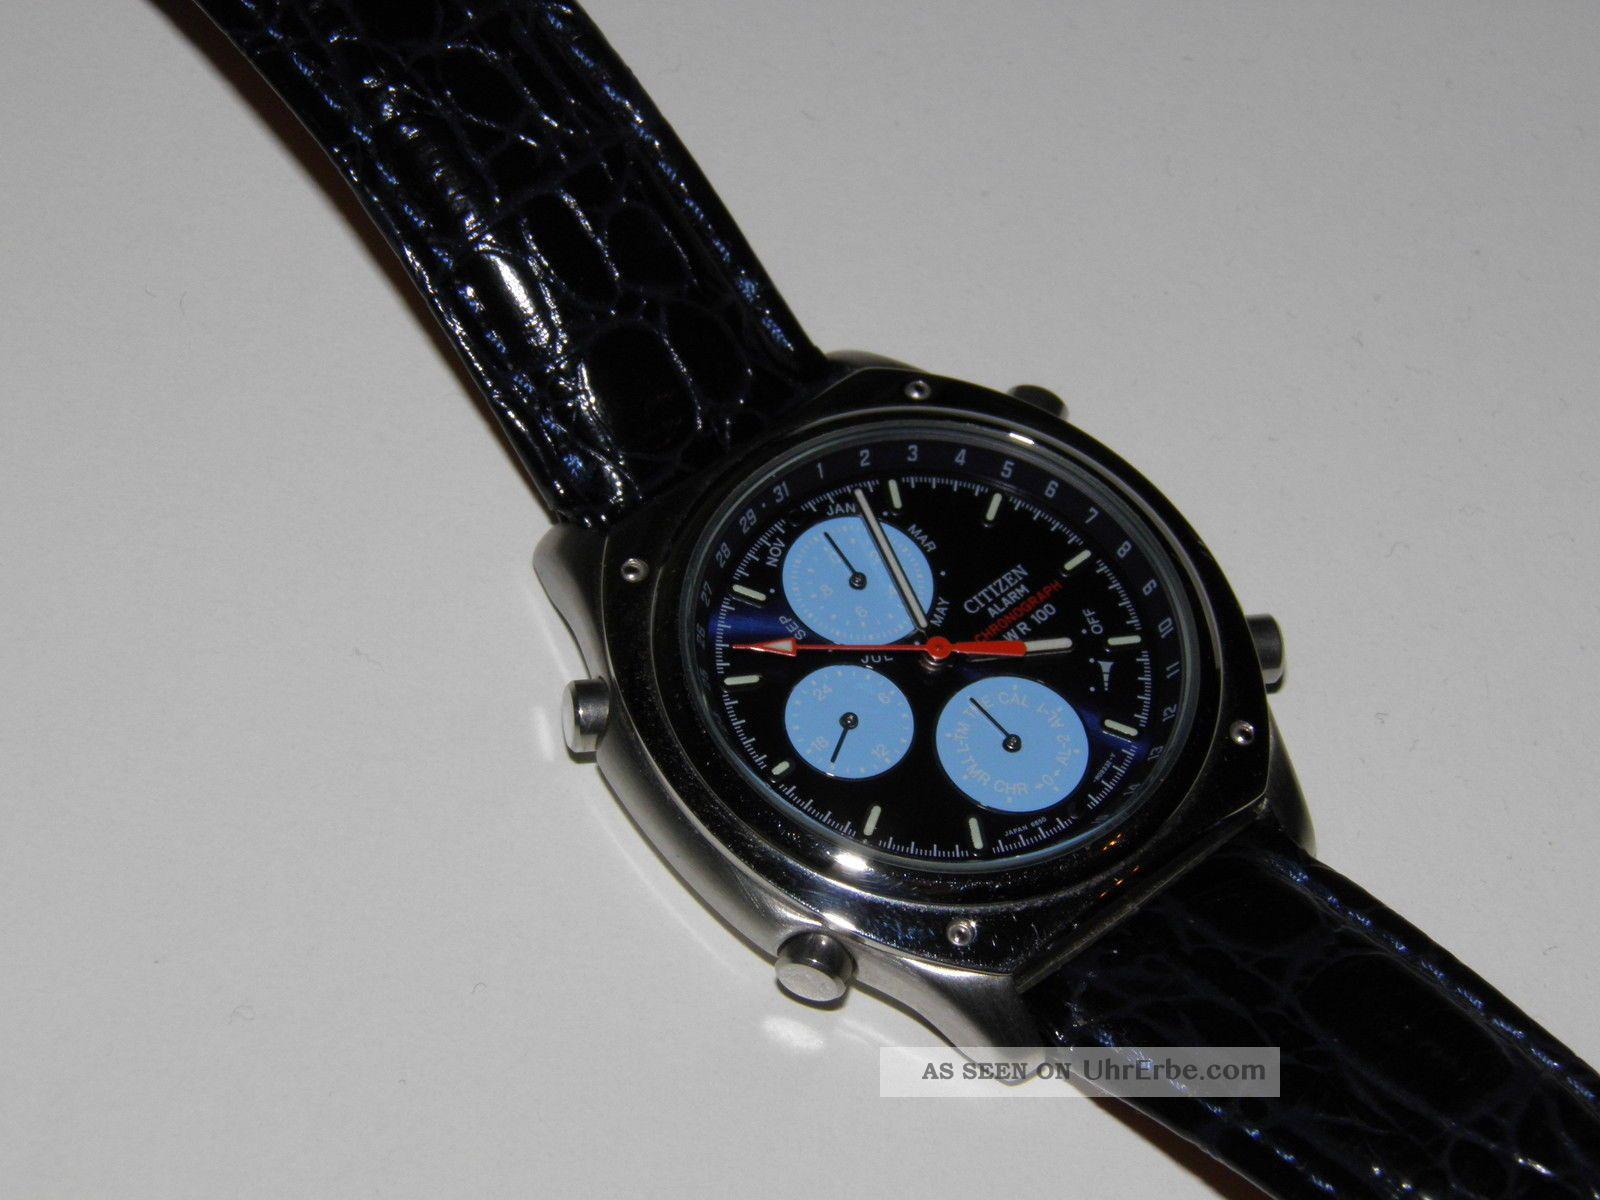 Citizen Chronograph Herrenarmbanduhr Cal.  6850 Stopuhr Alarm Kalender Neuwertig Armbanduhren Bild